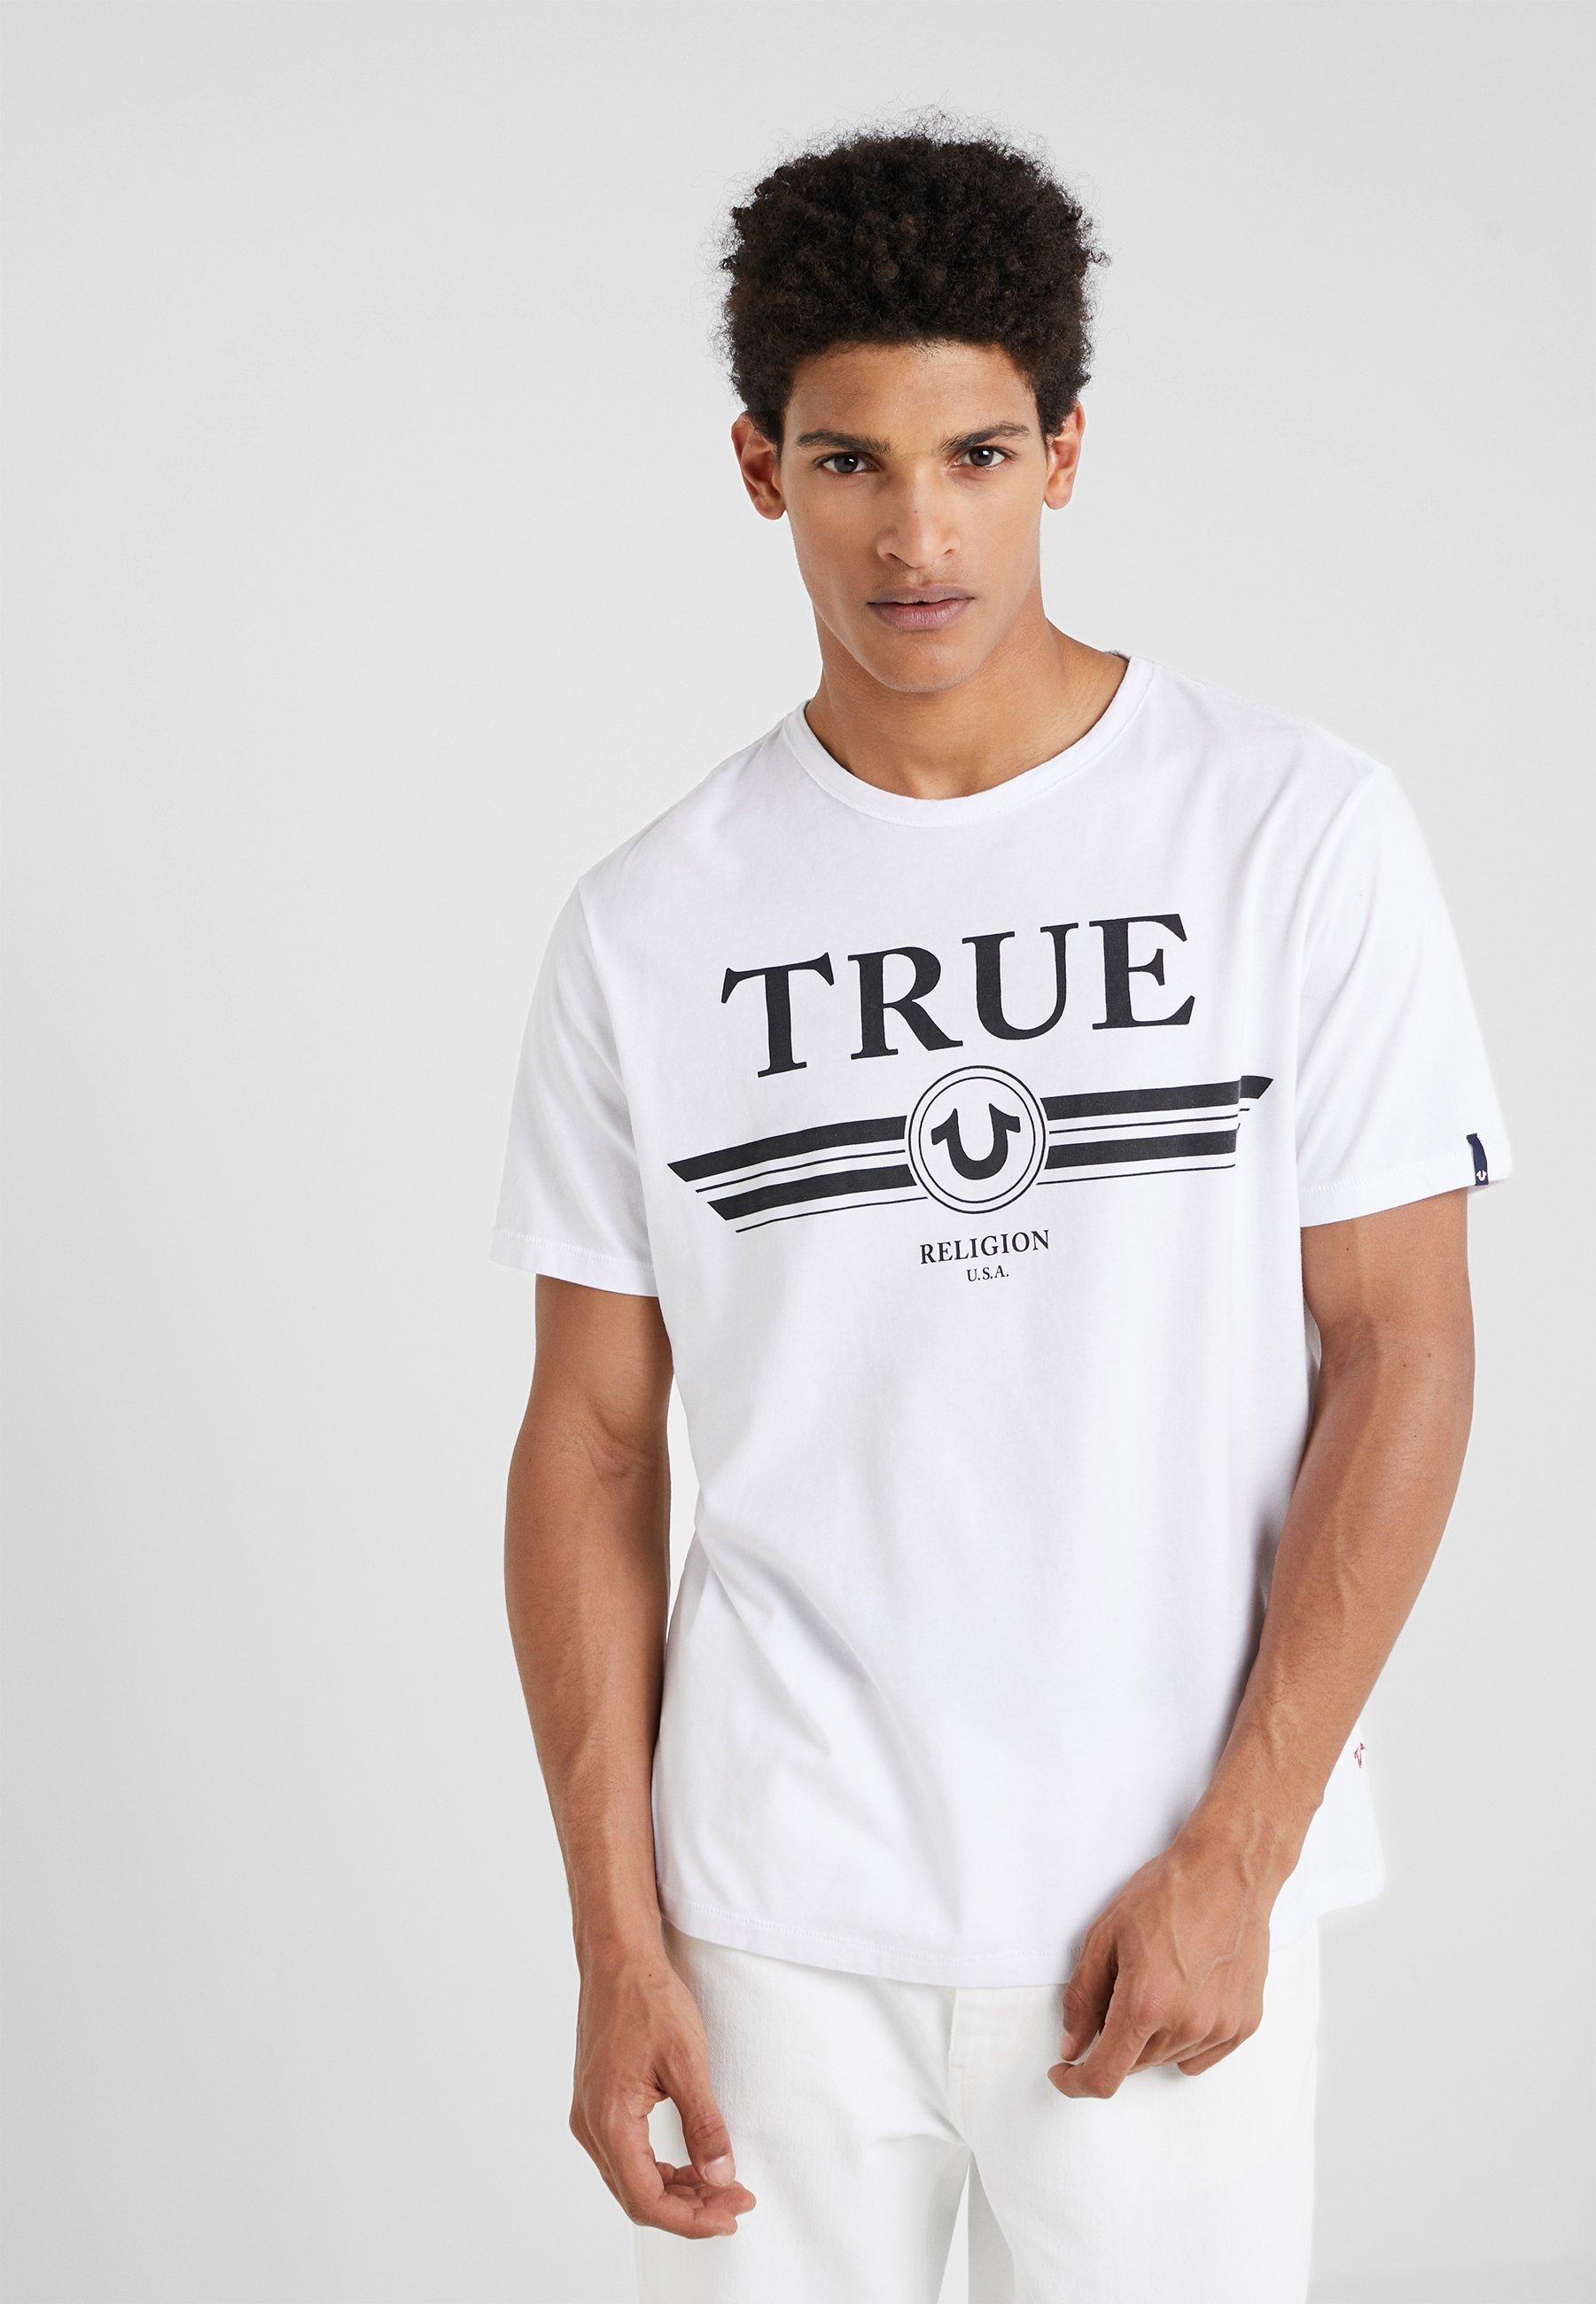 True TrucciT White Religion shirt Imprimé Basic kXPn0O8w